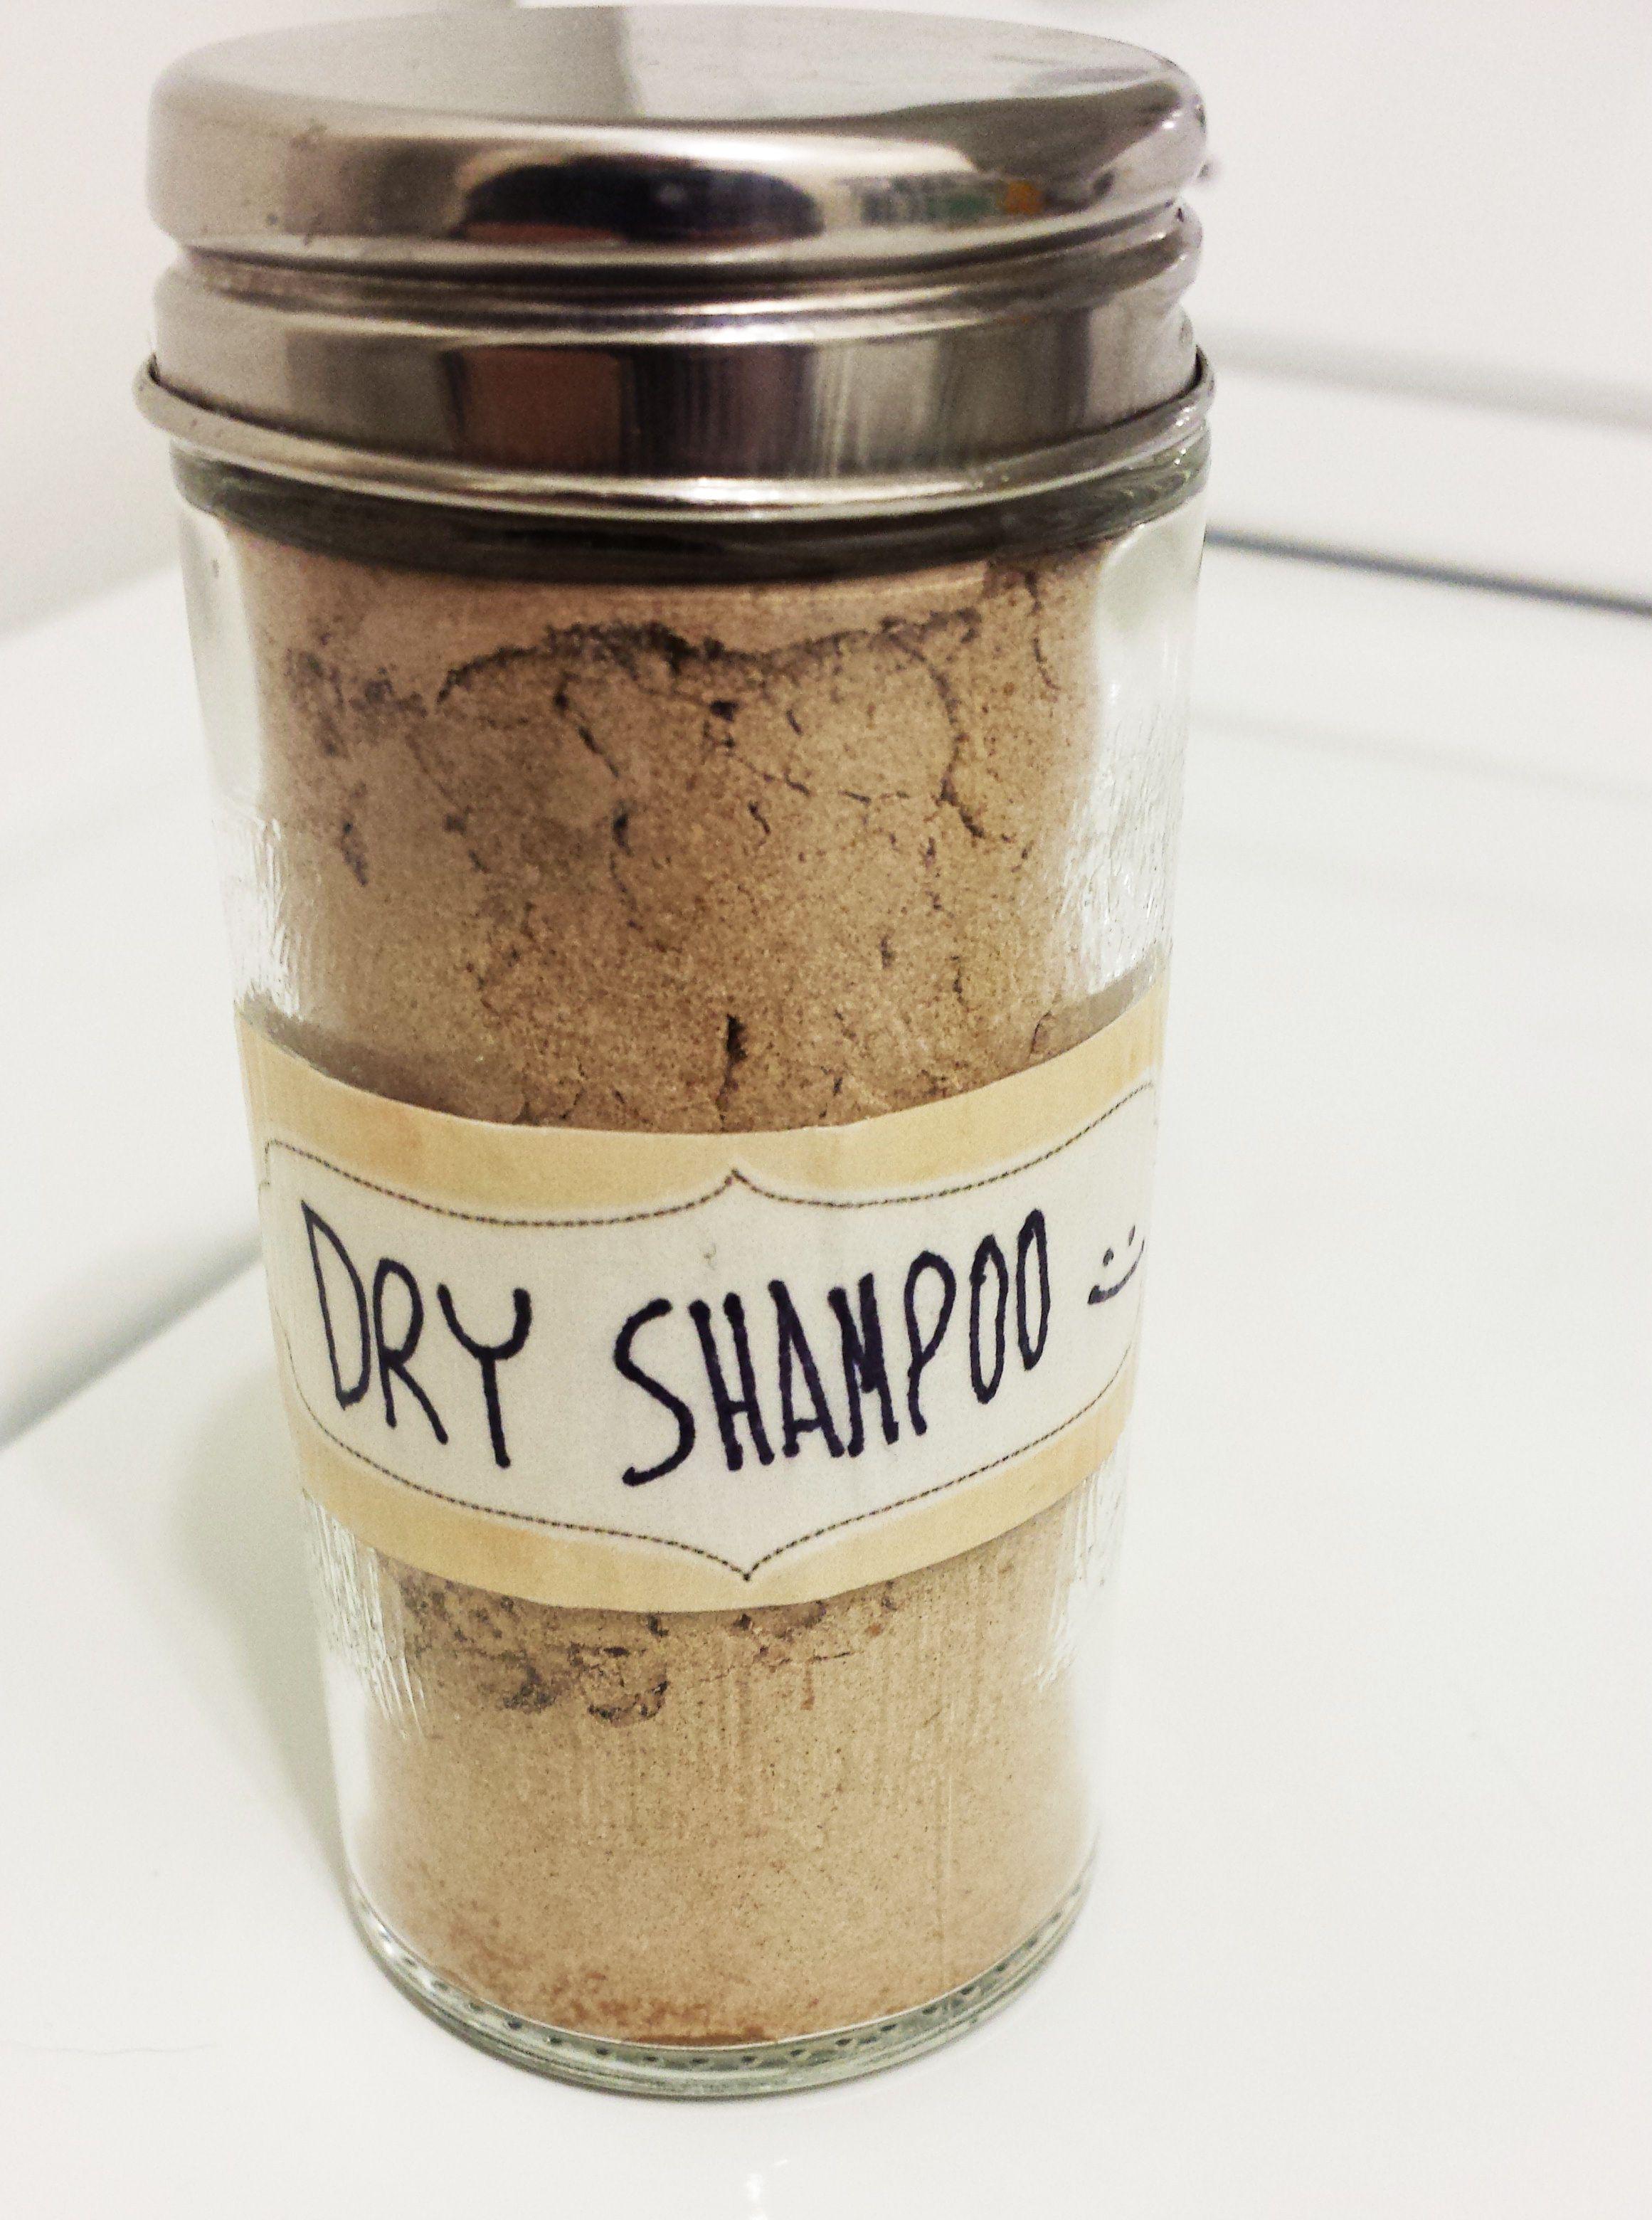 Dry shampoo dry shampoo cookie dough baking ingredients